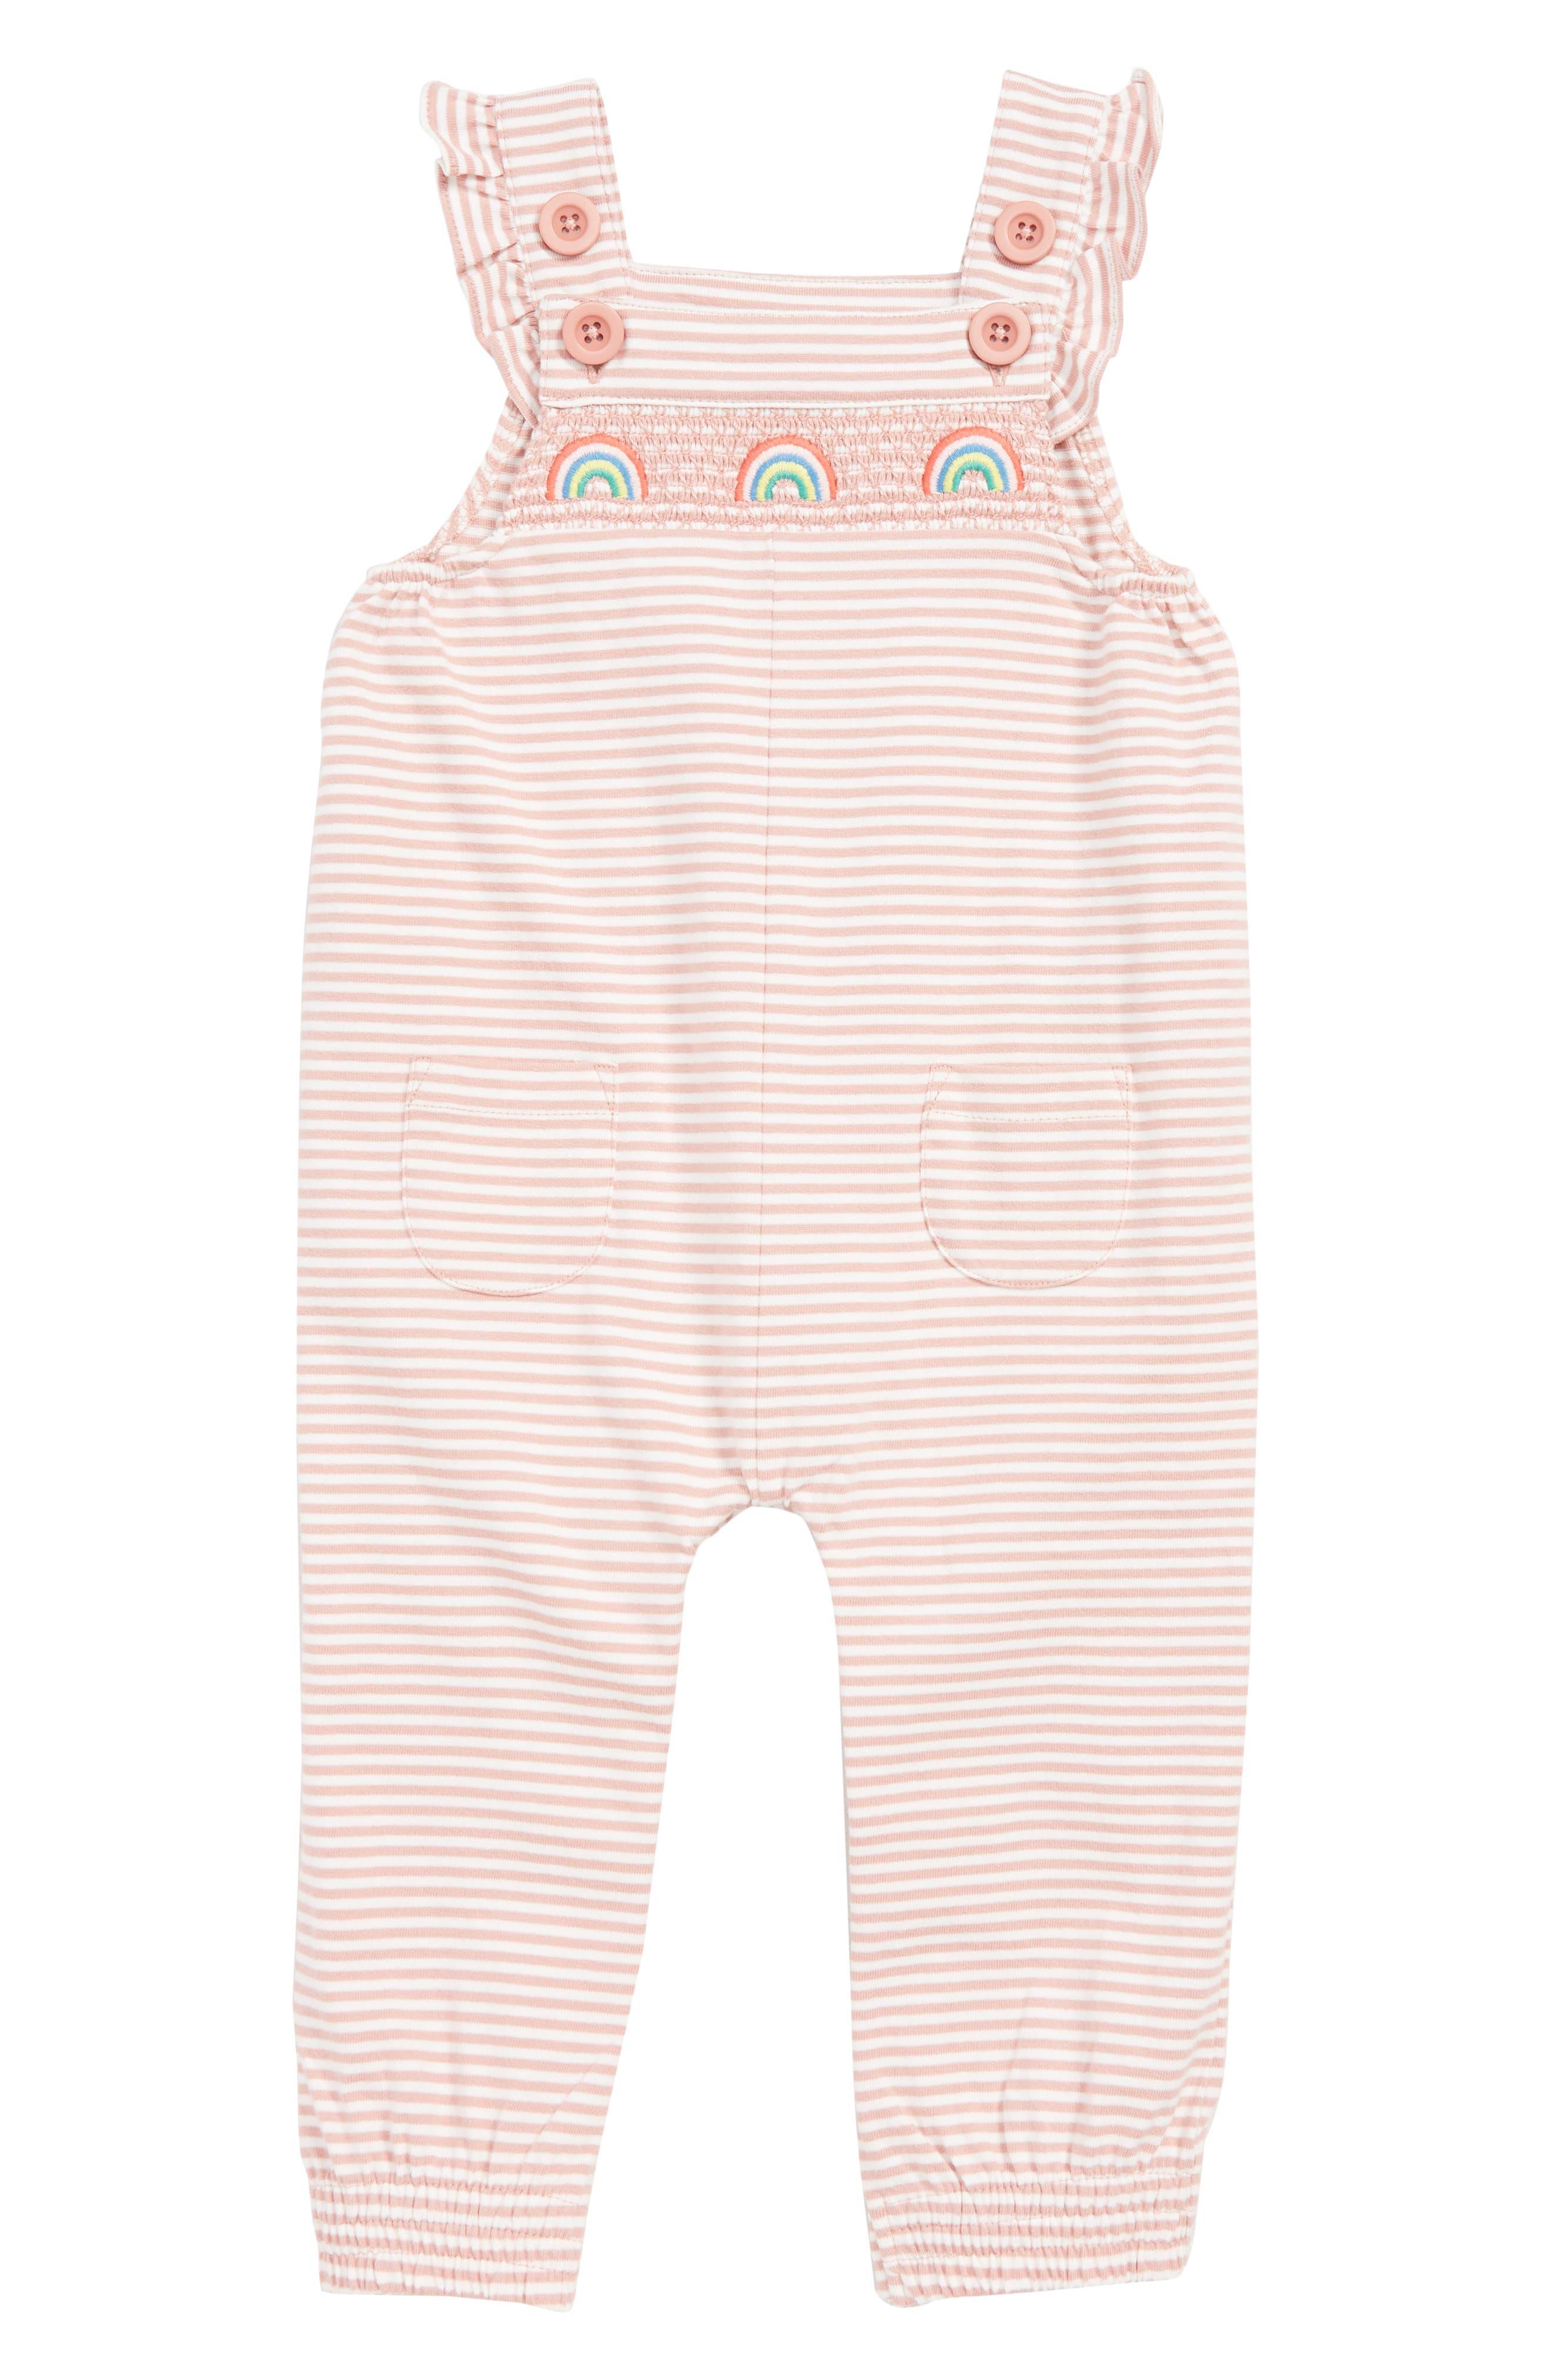 Infant Girls Mini Boden Smocked Rainbow Jersey Romper Size 612M  Pink